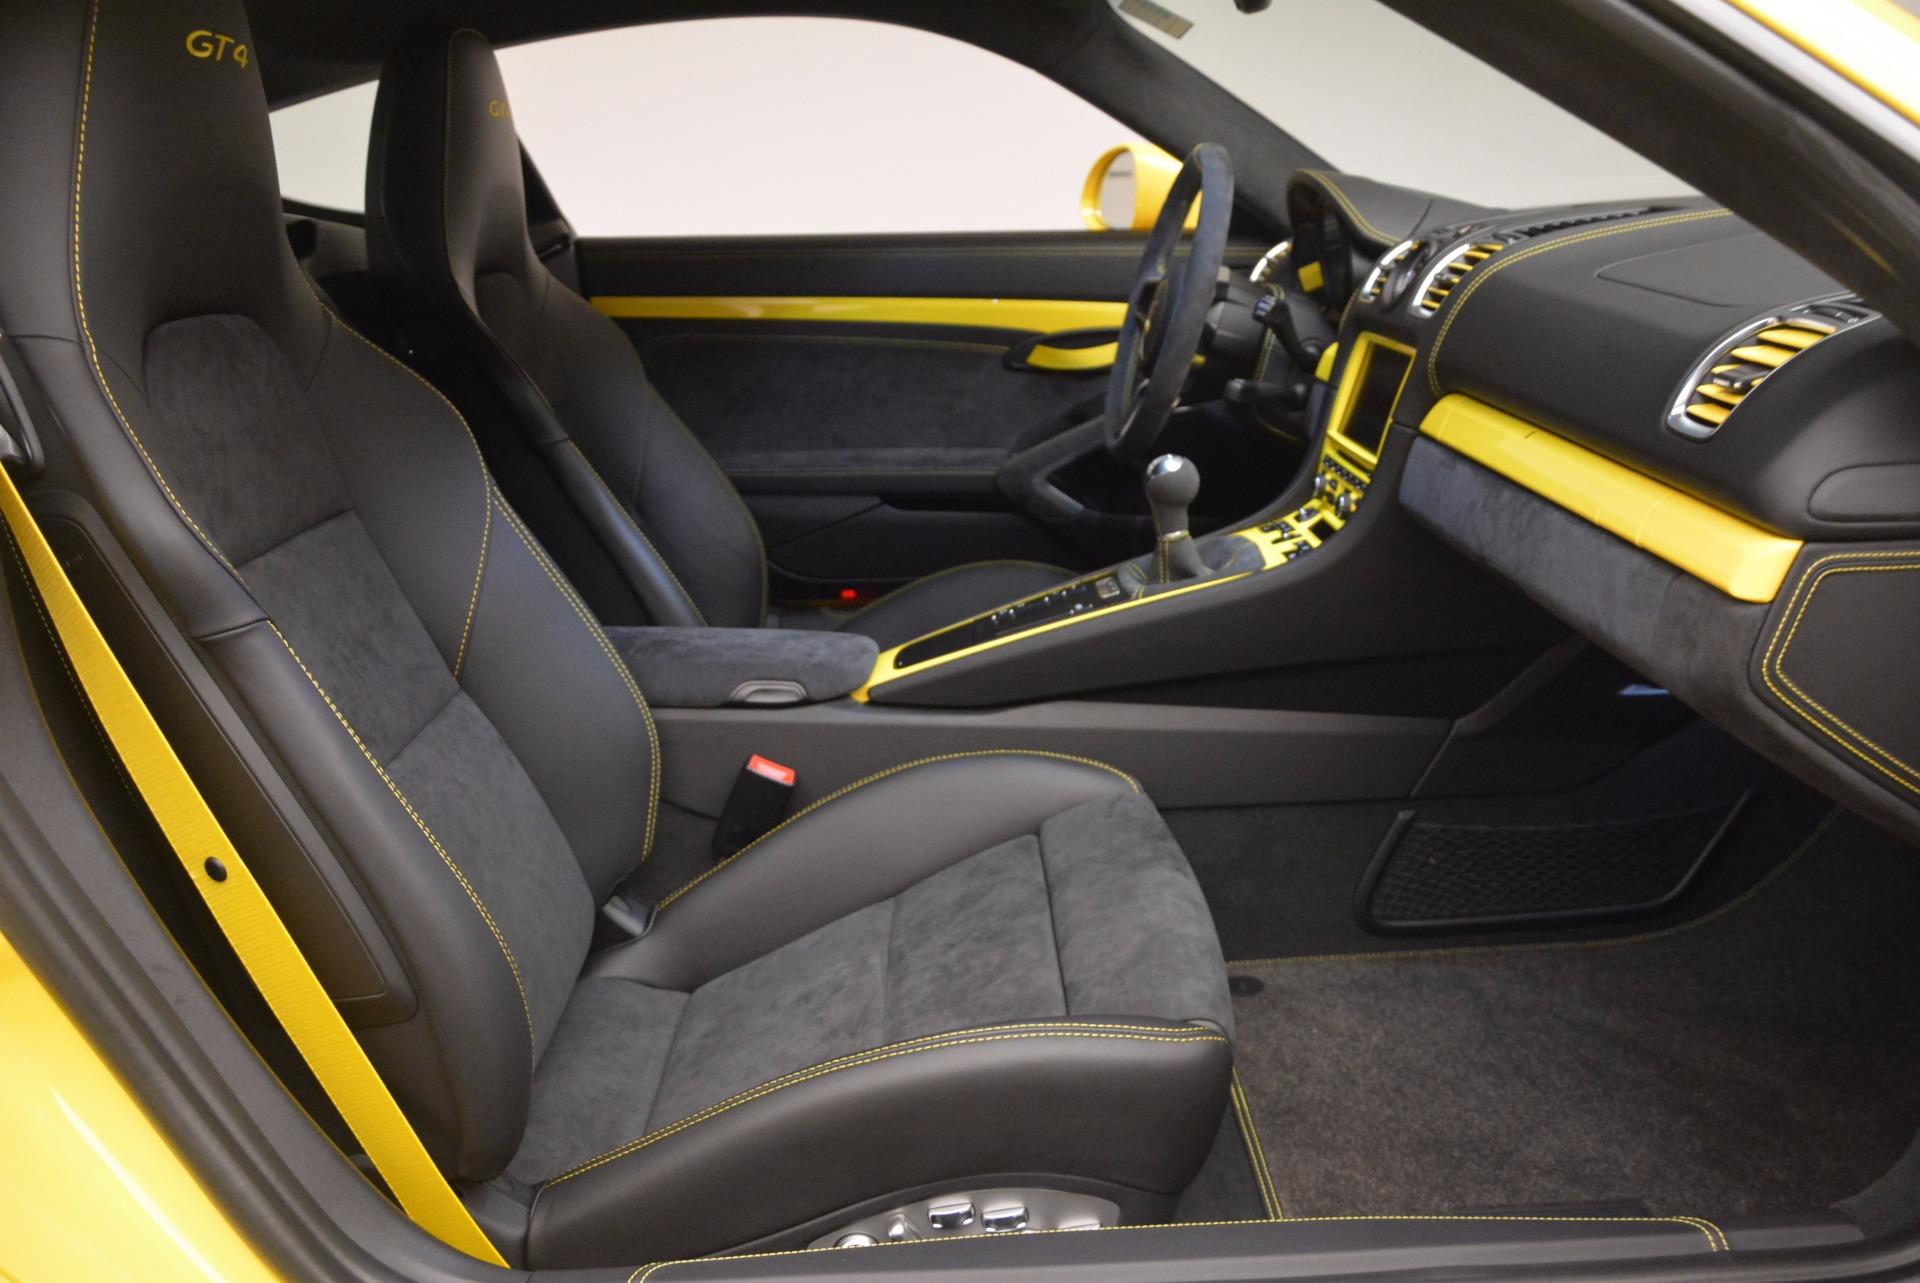 Used 2016 Porsche Cayman GT4 For Sale In Westport, CT 1401_p18